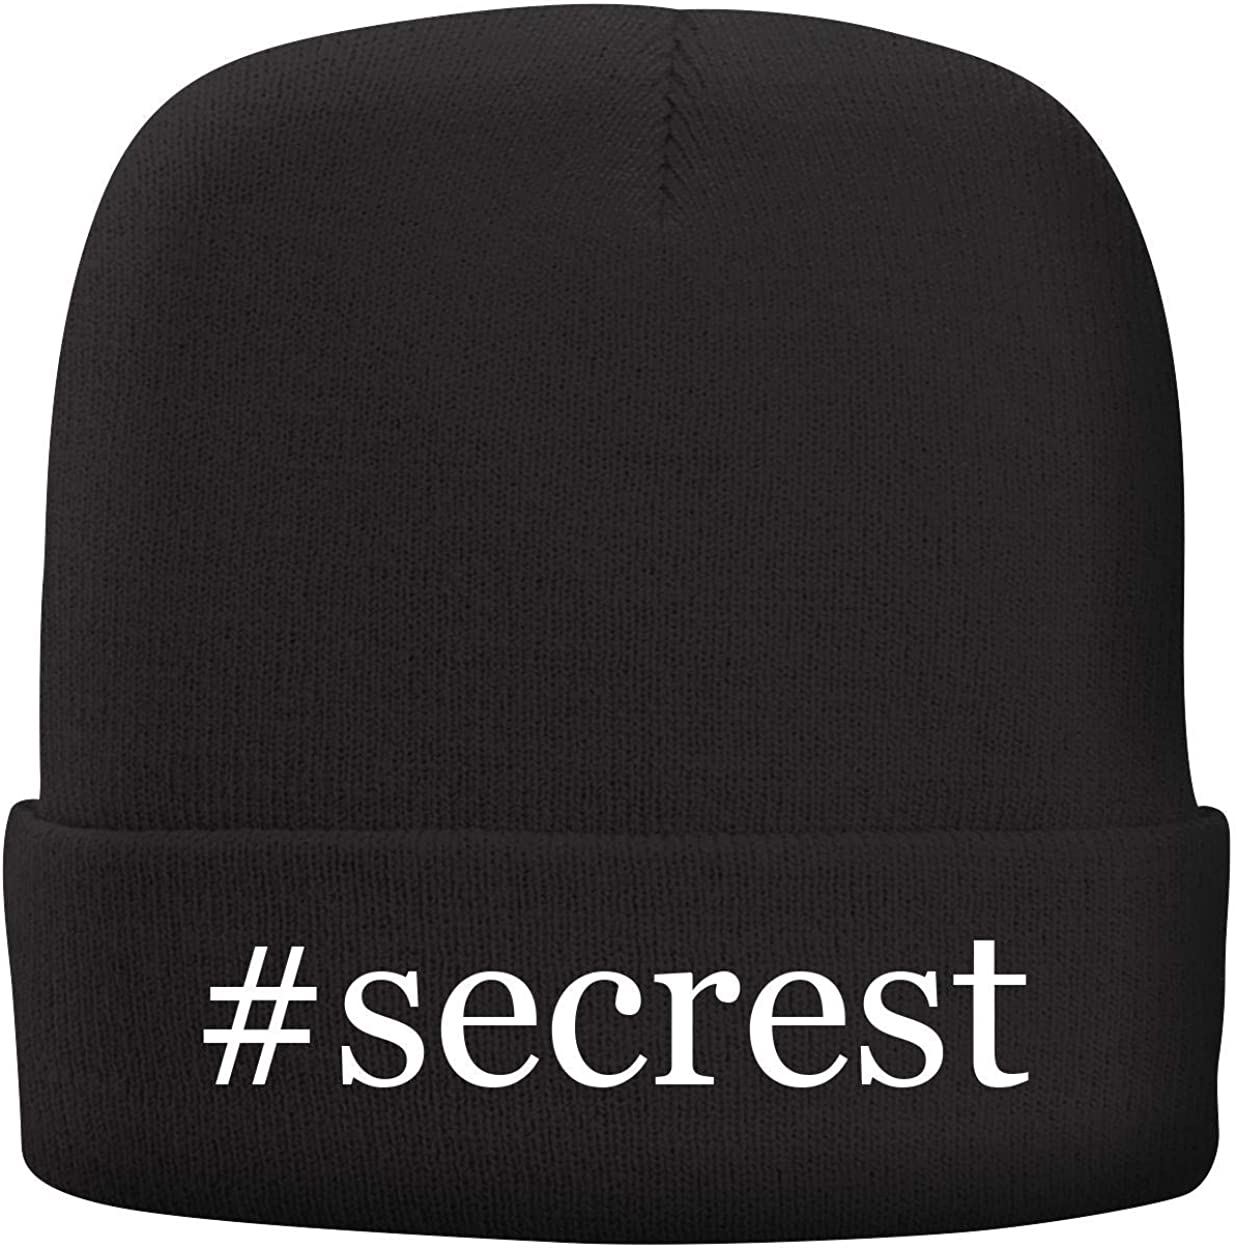 Adult Hashtag Comfortable Fleece Lined Beanie BH Cool Designs #Secrest